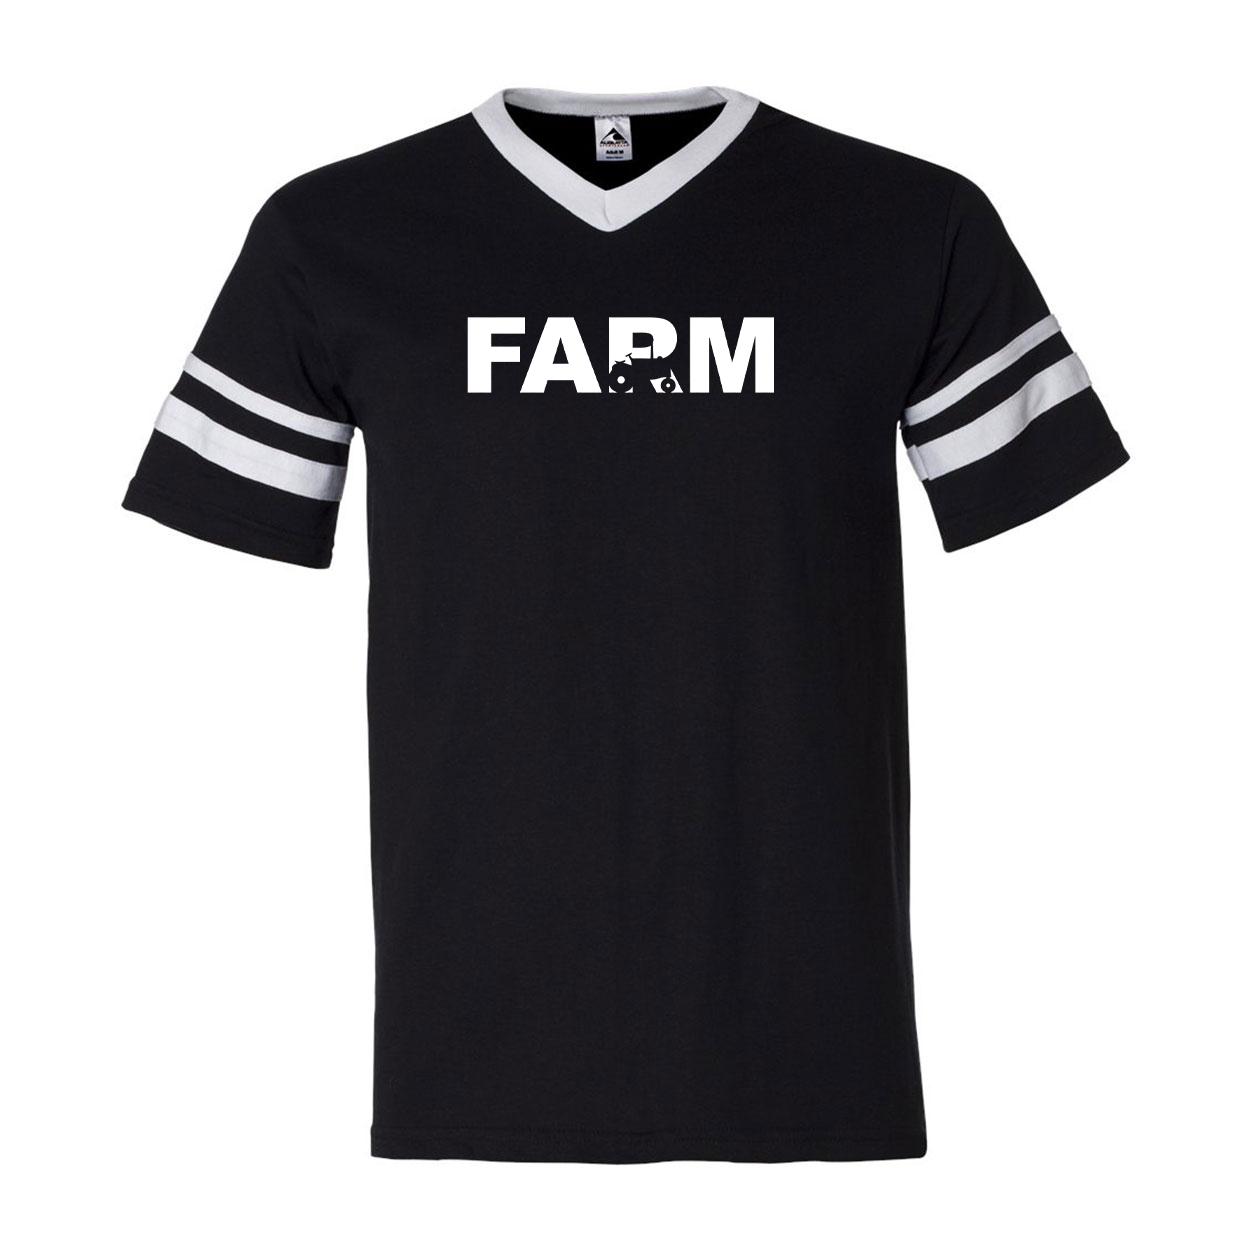 Farm Tractor Logo Classic Premium Striped Jersey T-Shirt Black/White (White Logo)